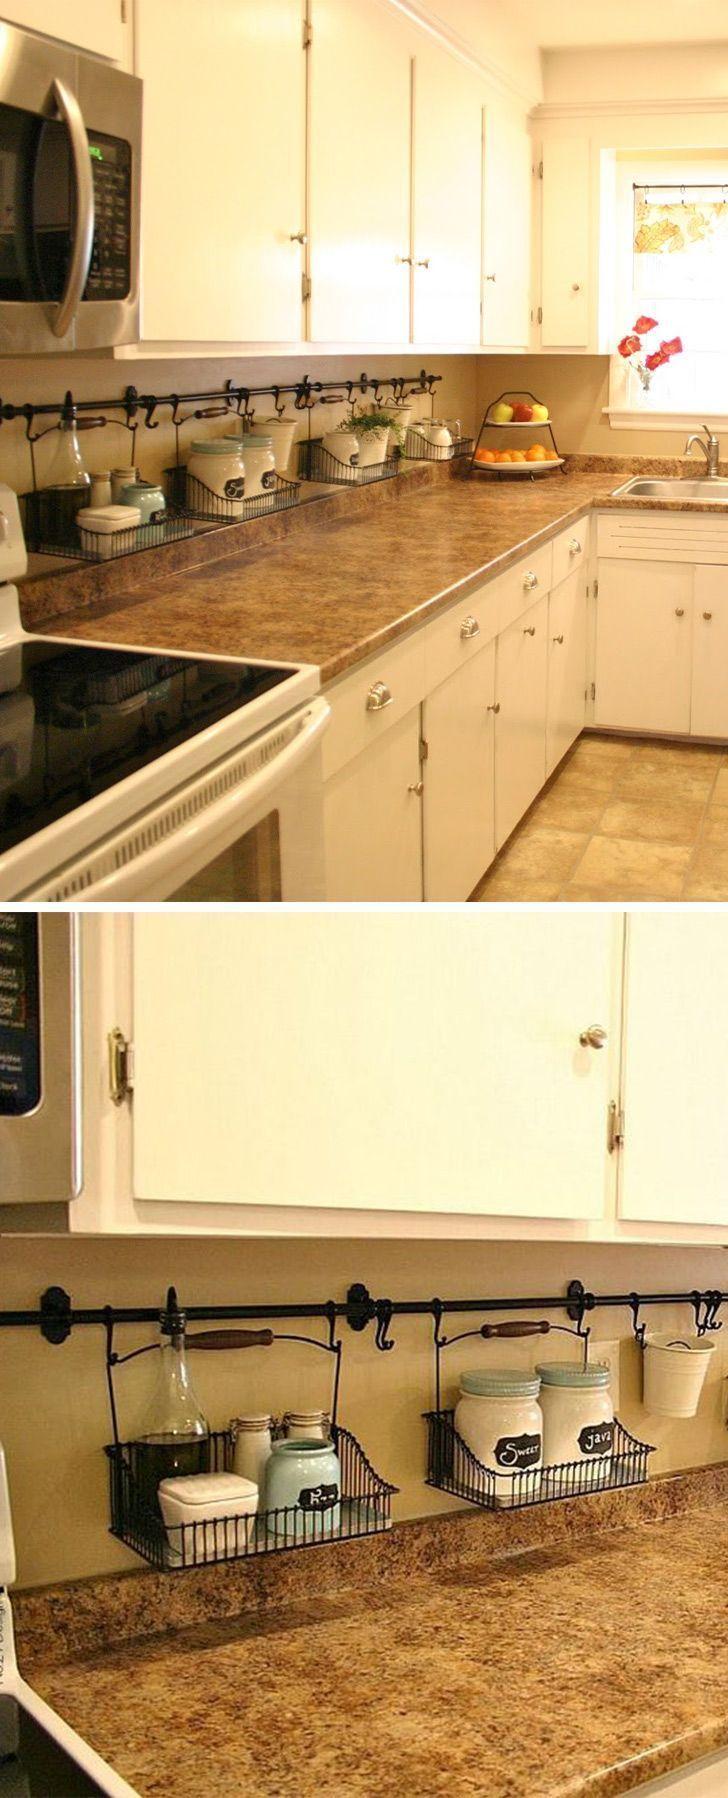 Best 20 Small Kitchen Renovations Ideas | Bricolage | Pinterest ...